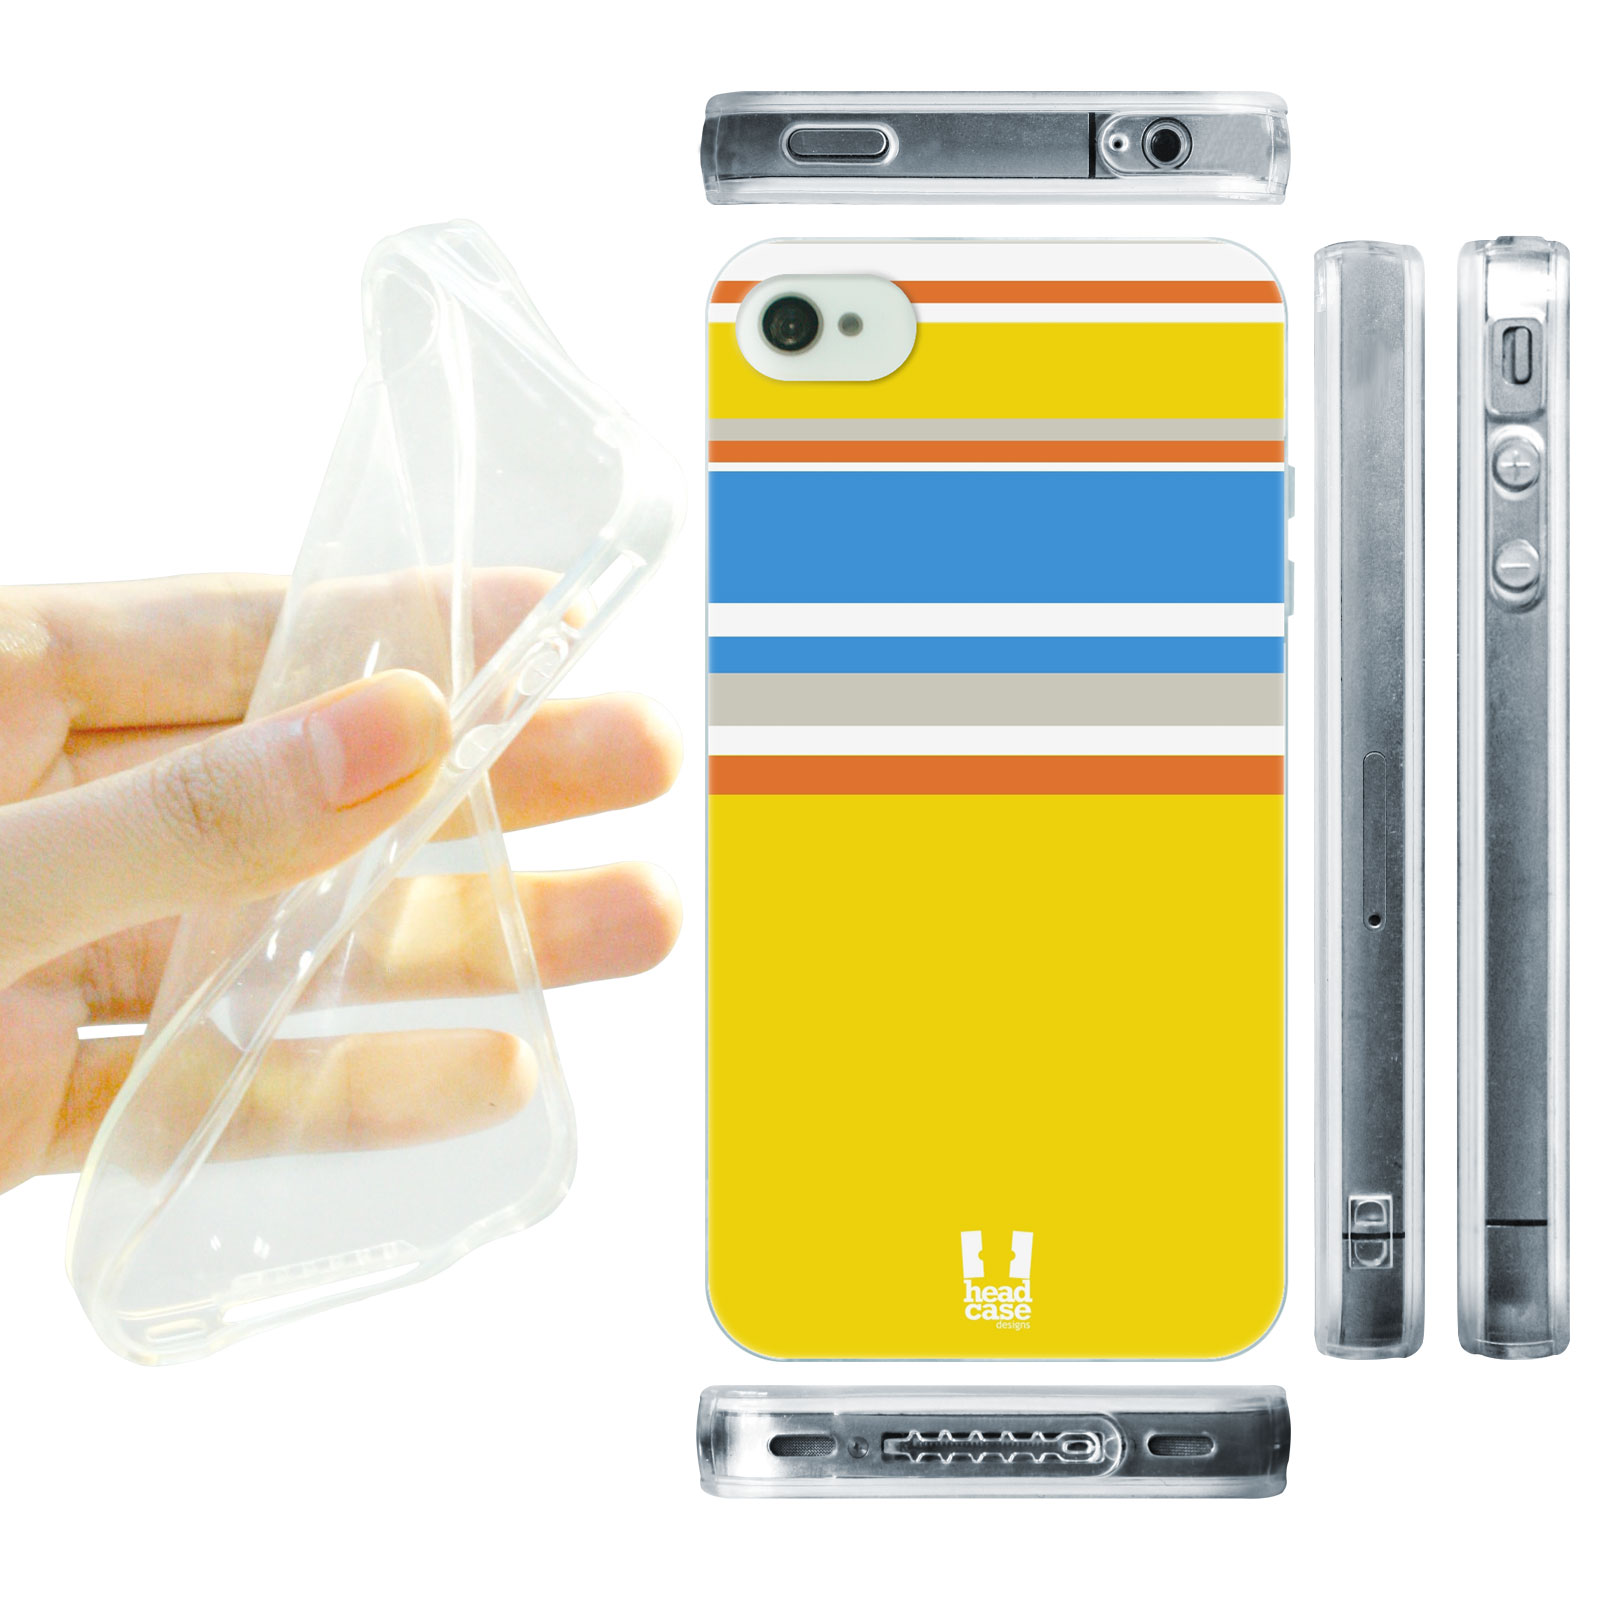 HEAD CASE silikonový obal na mobil Iphone 4/4S barevné pruhy žlutá modrá pláž